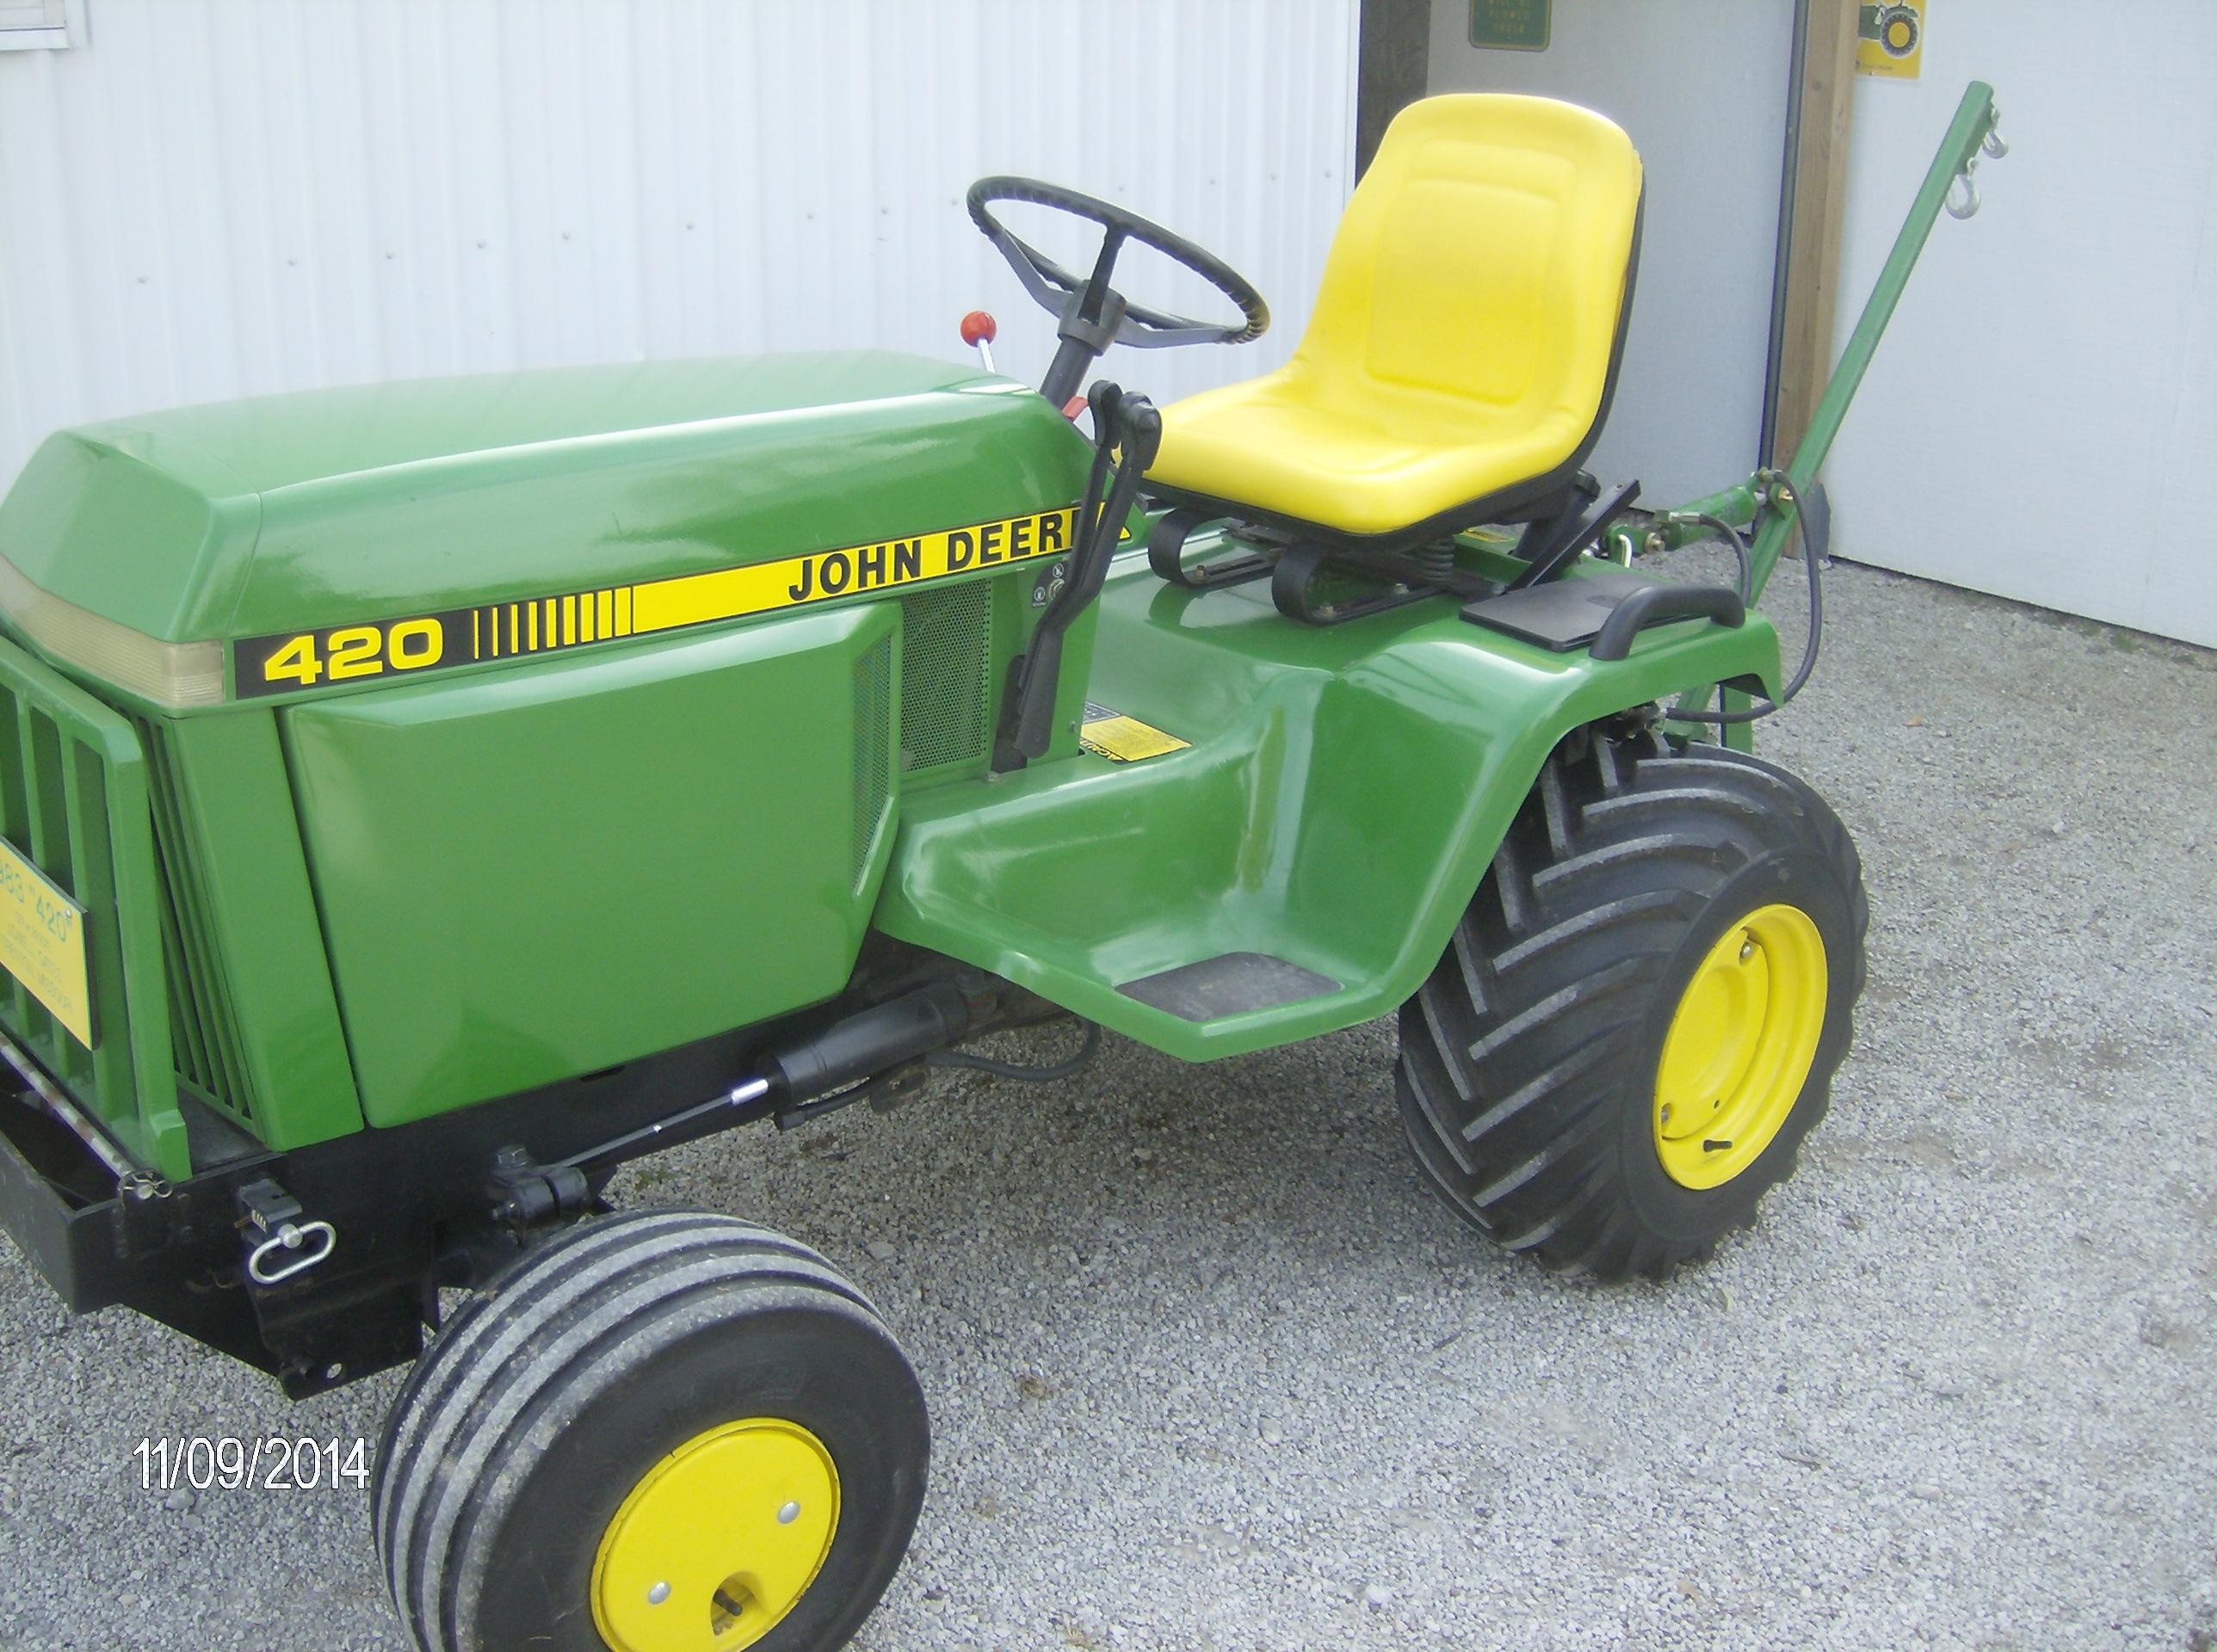 For Sale In North Missouri 1983 Jd 420 Garden Tractor